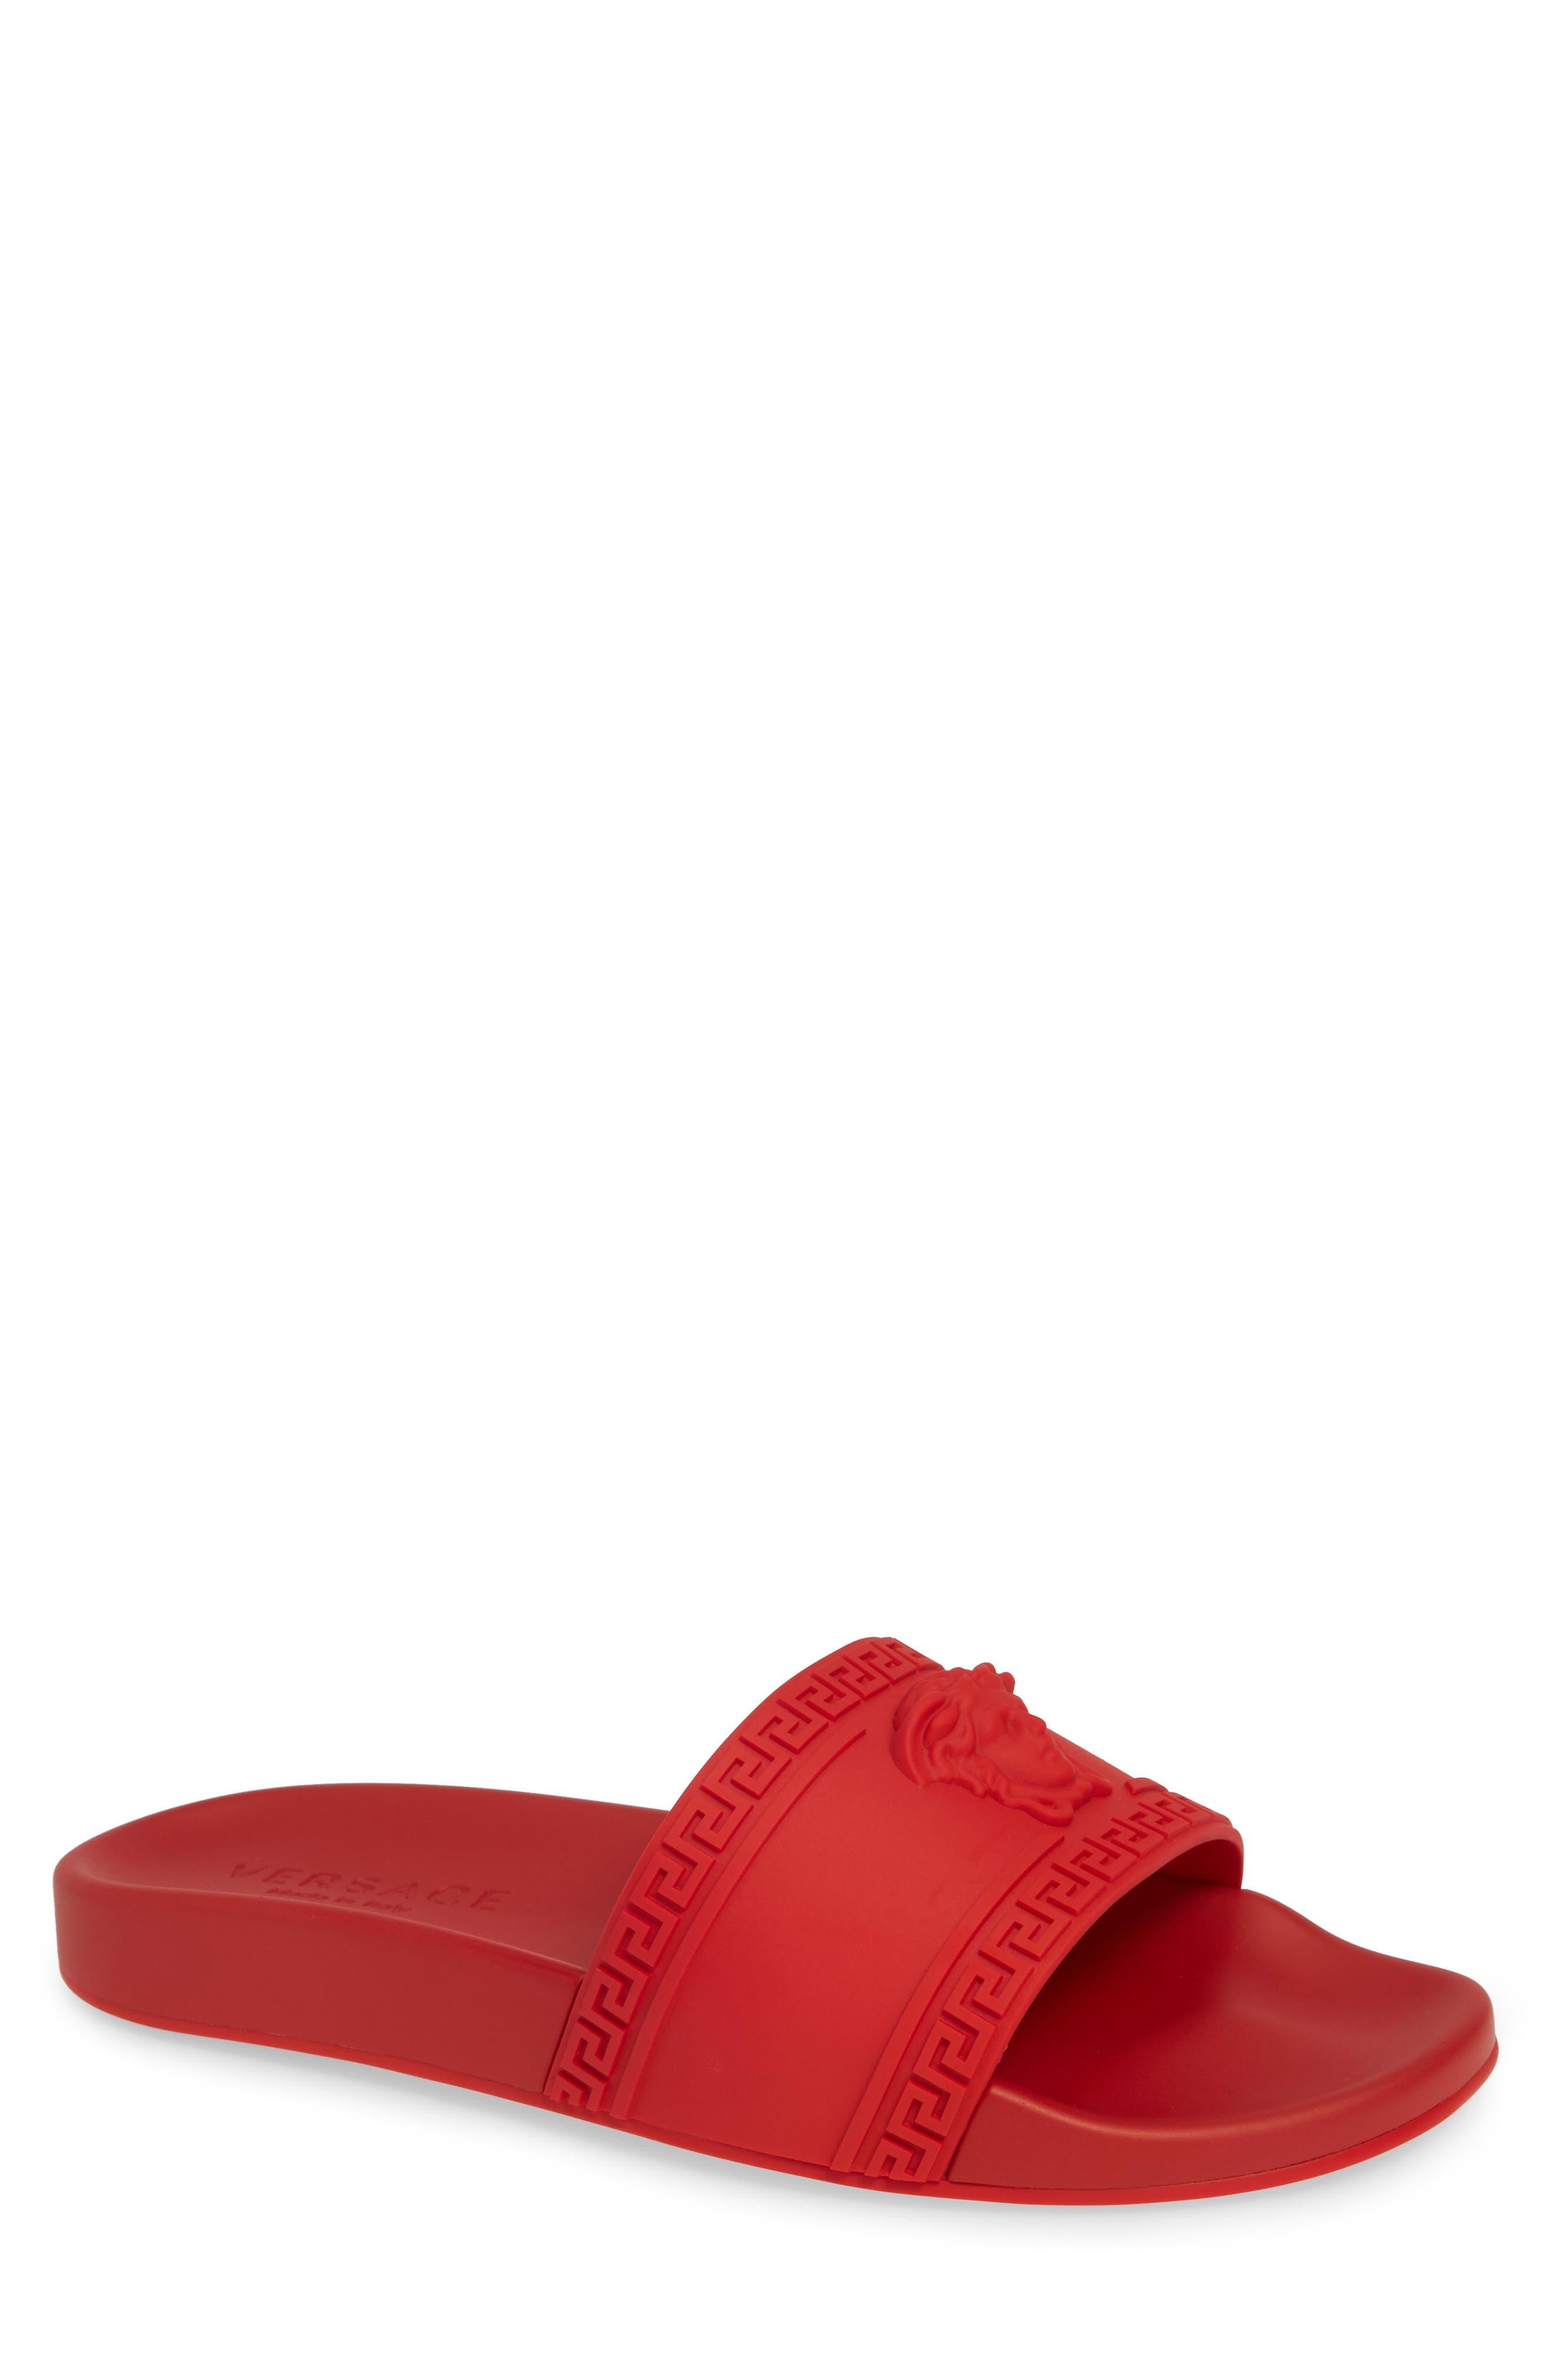 Palazzo Medusa Slide Sandal, Main, color, RED